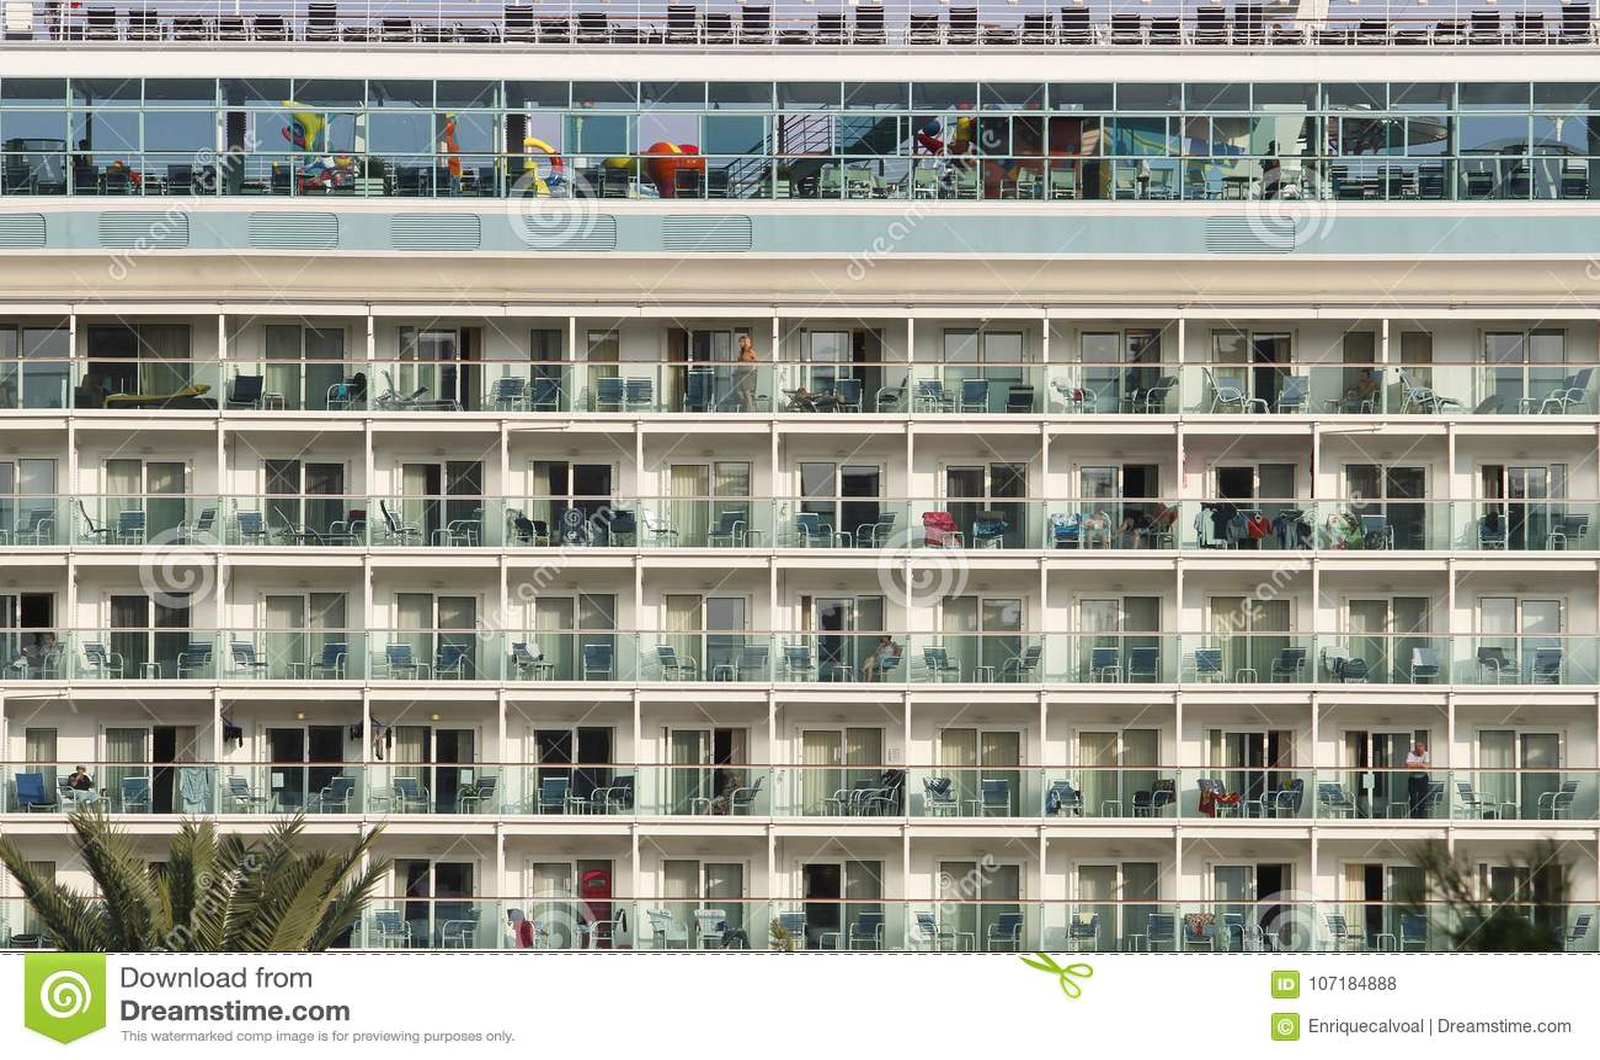 Cruise ship decks at port